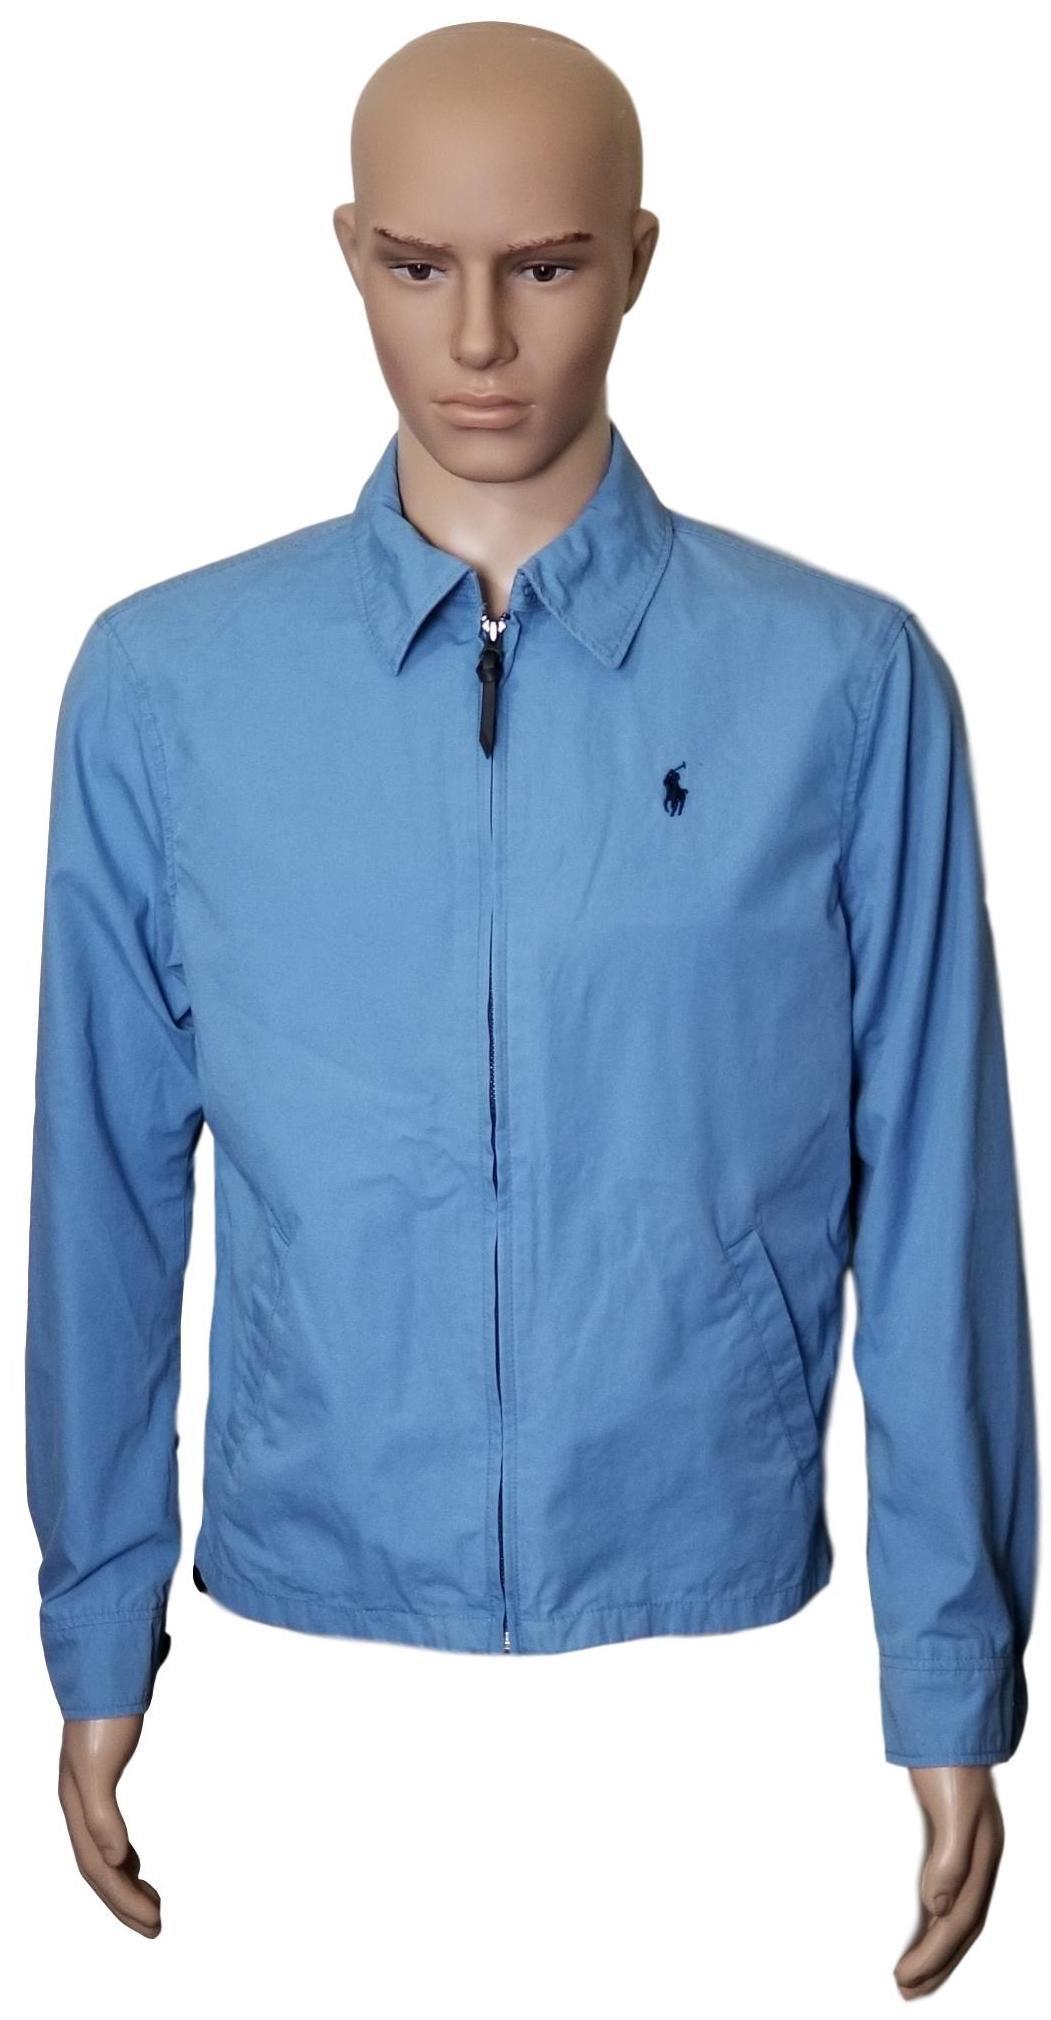 ac244a396 Polo Ralph Lauren Men's Landon Cotton Poplin Windbreaker Jacket, Light  Blue, XL